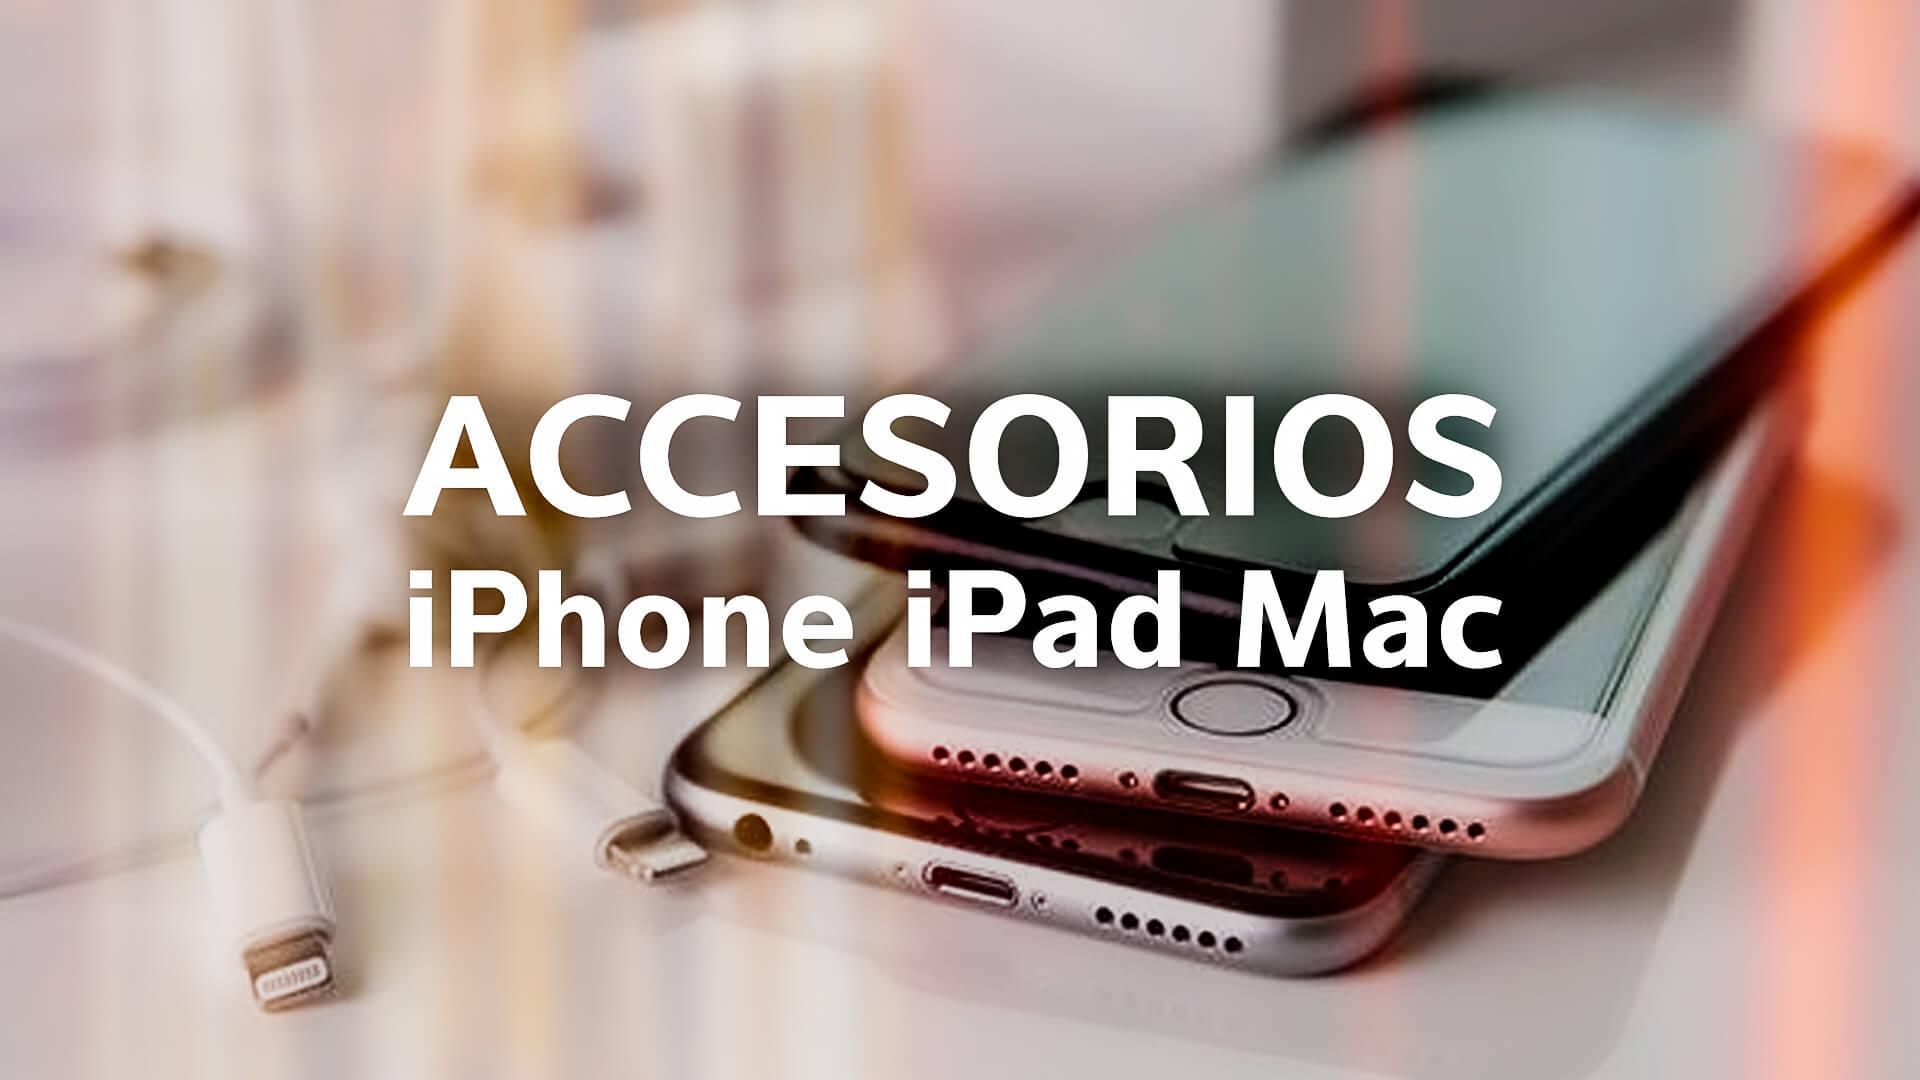 Accesorios baratos iPhone iPad Mac 1